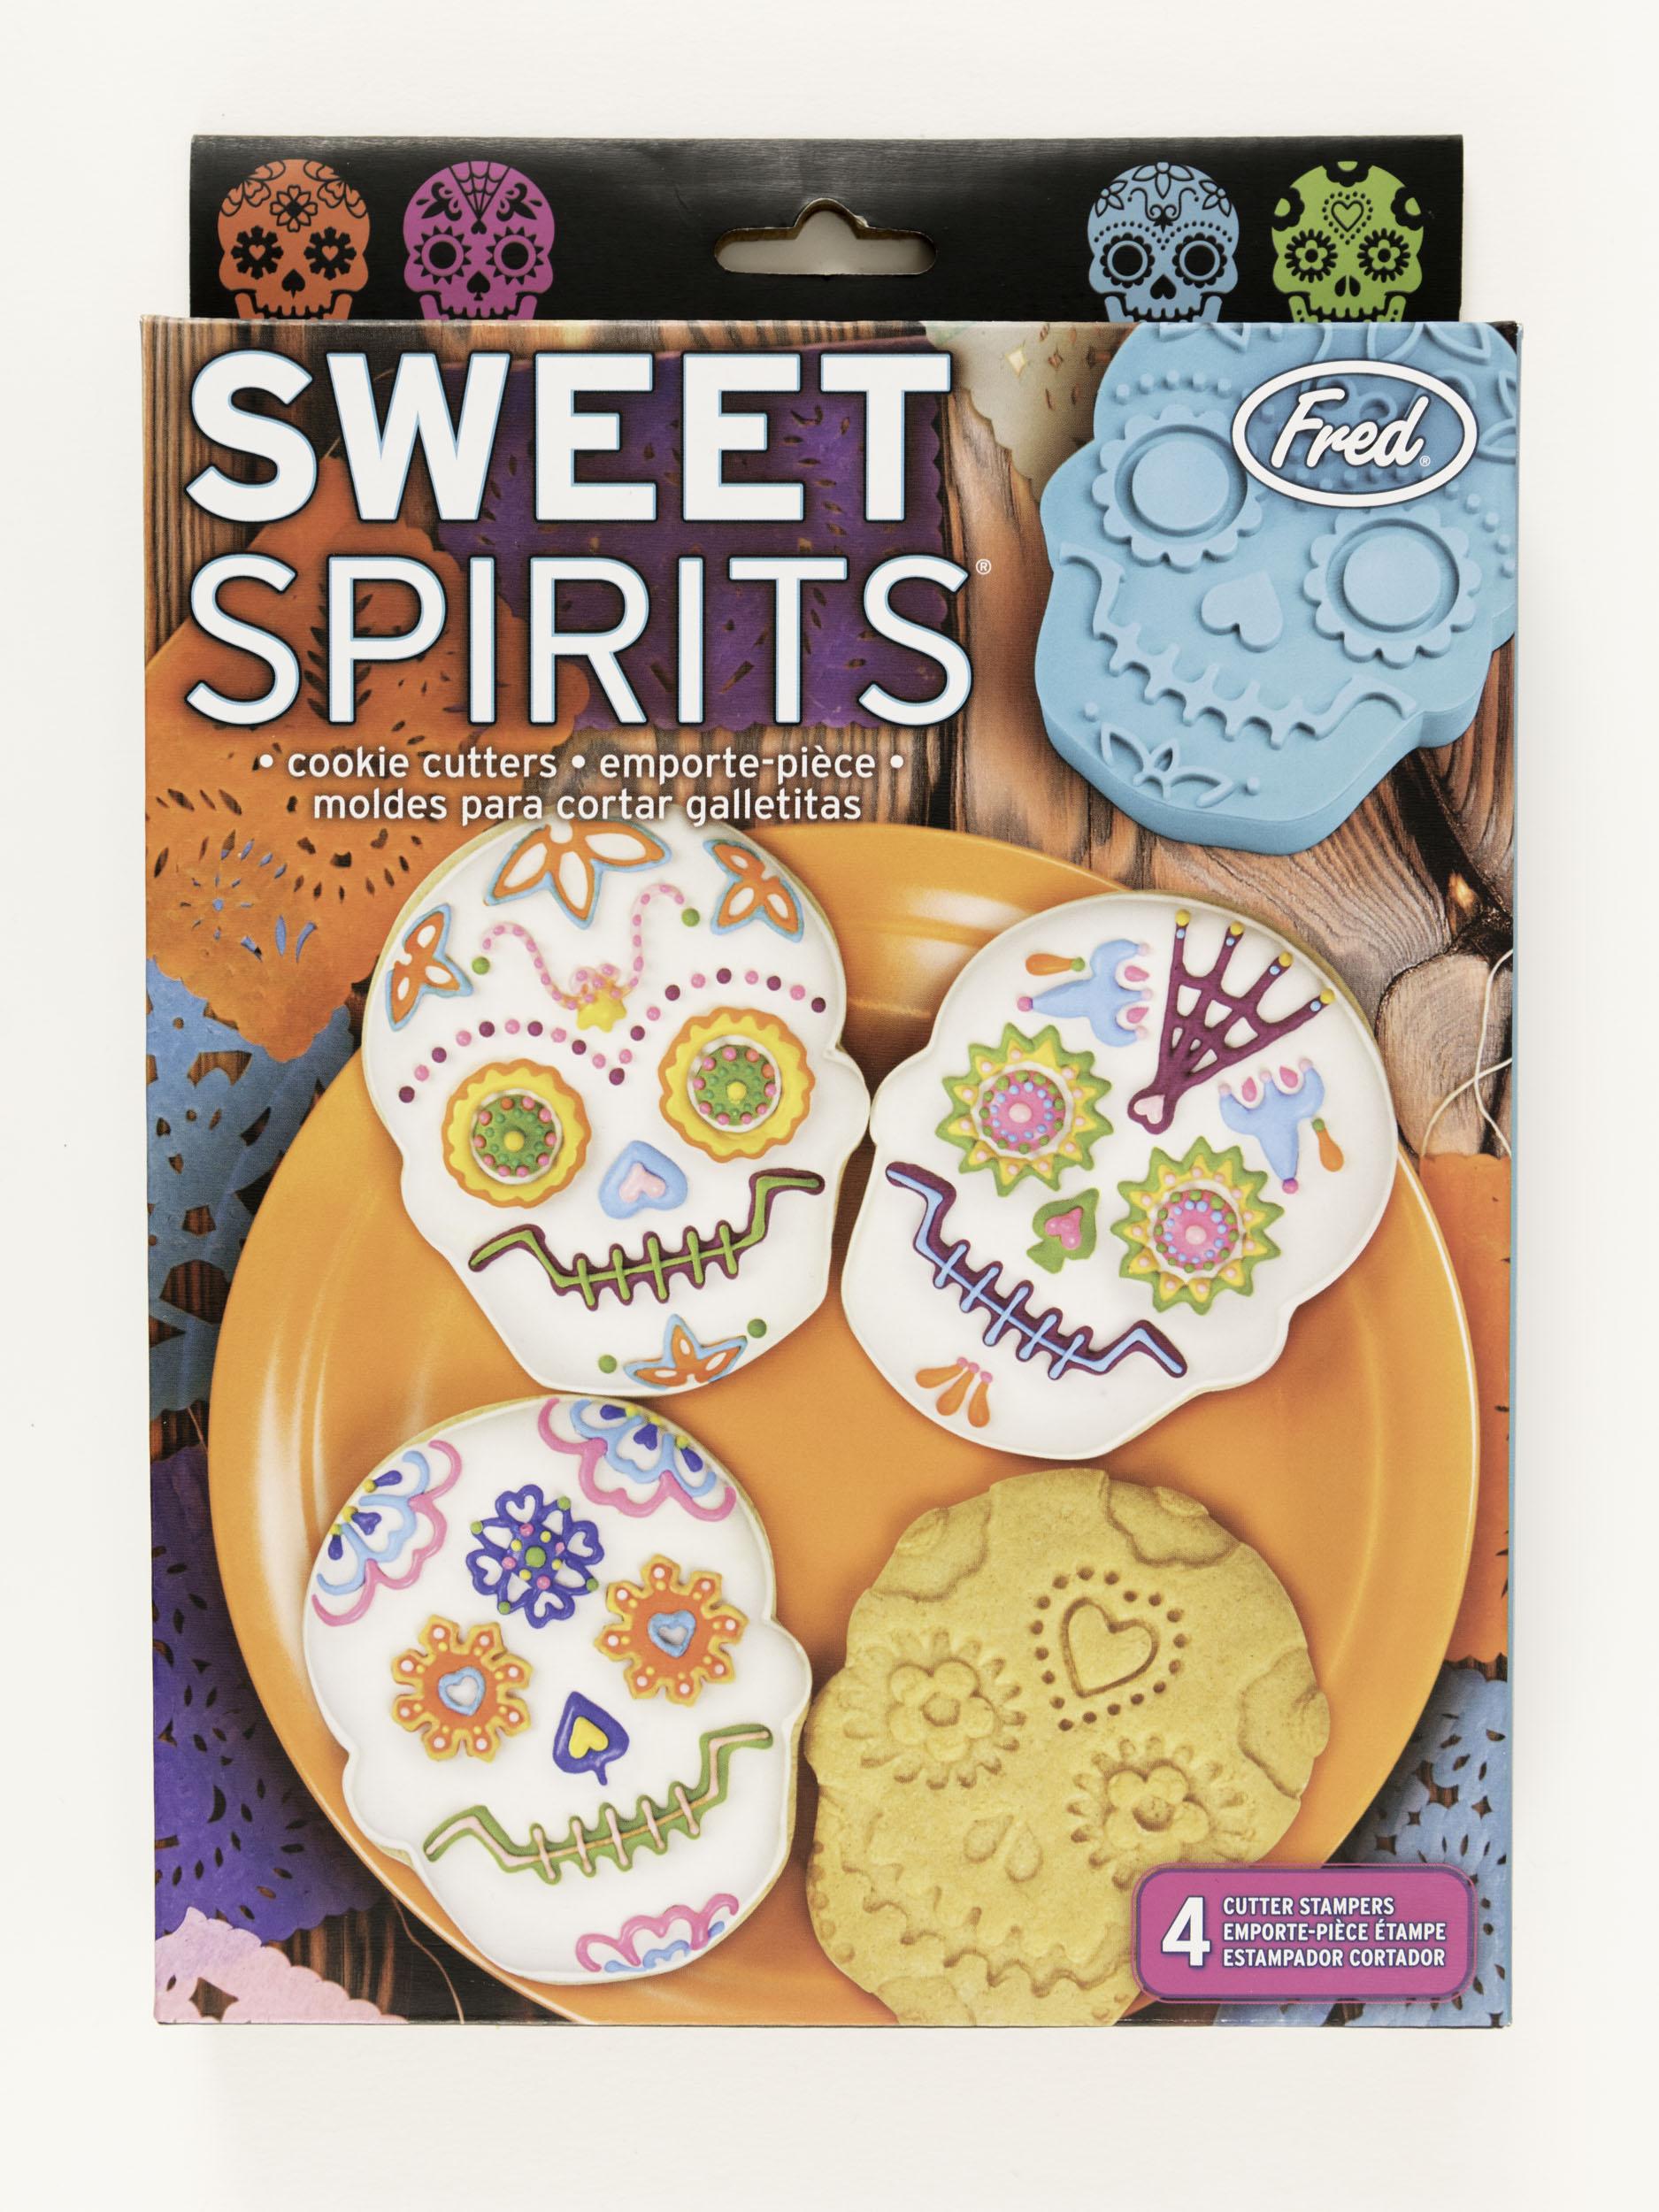 Sweet Spirits Cookie Cutters,SWSP